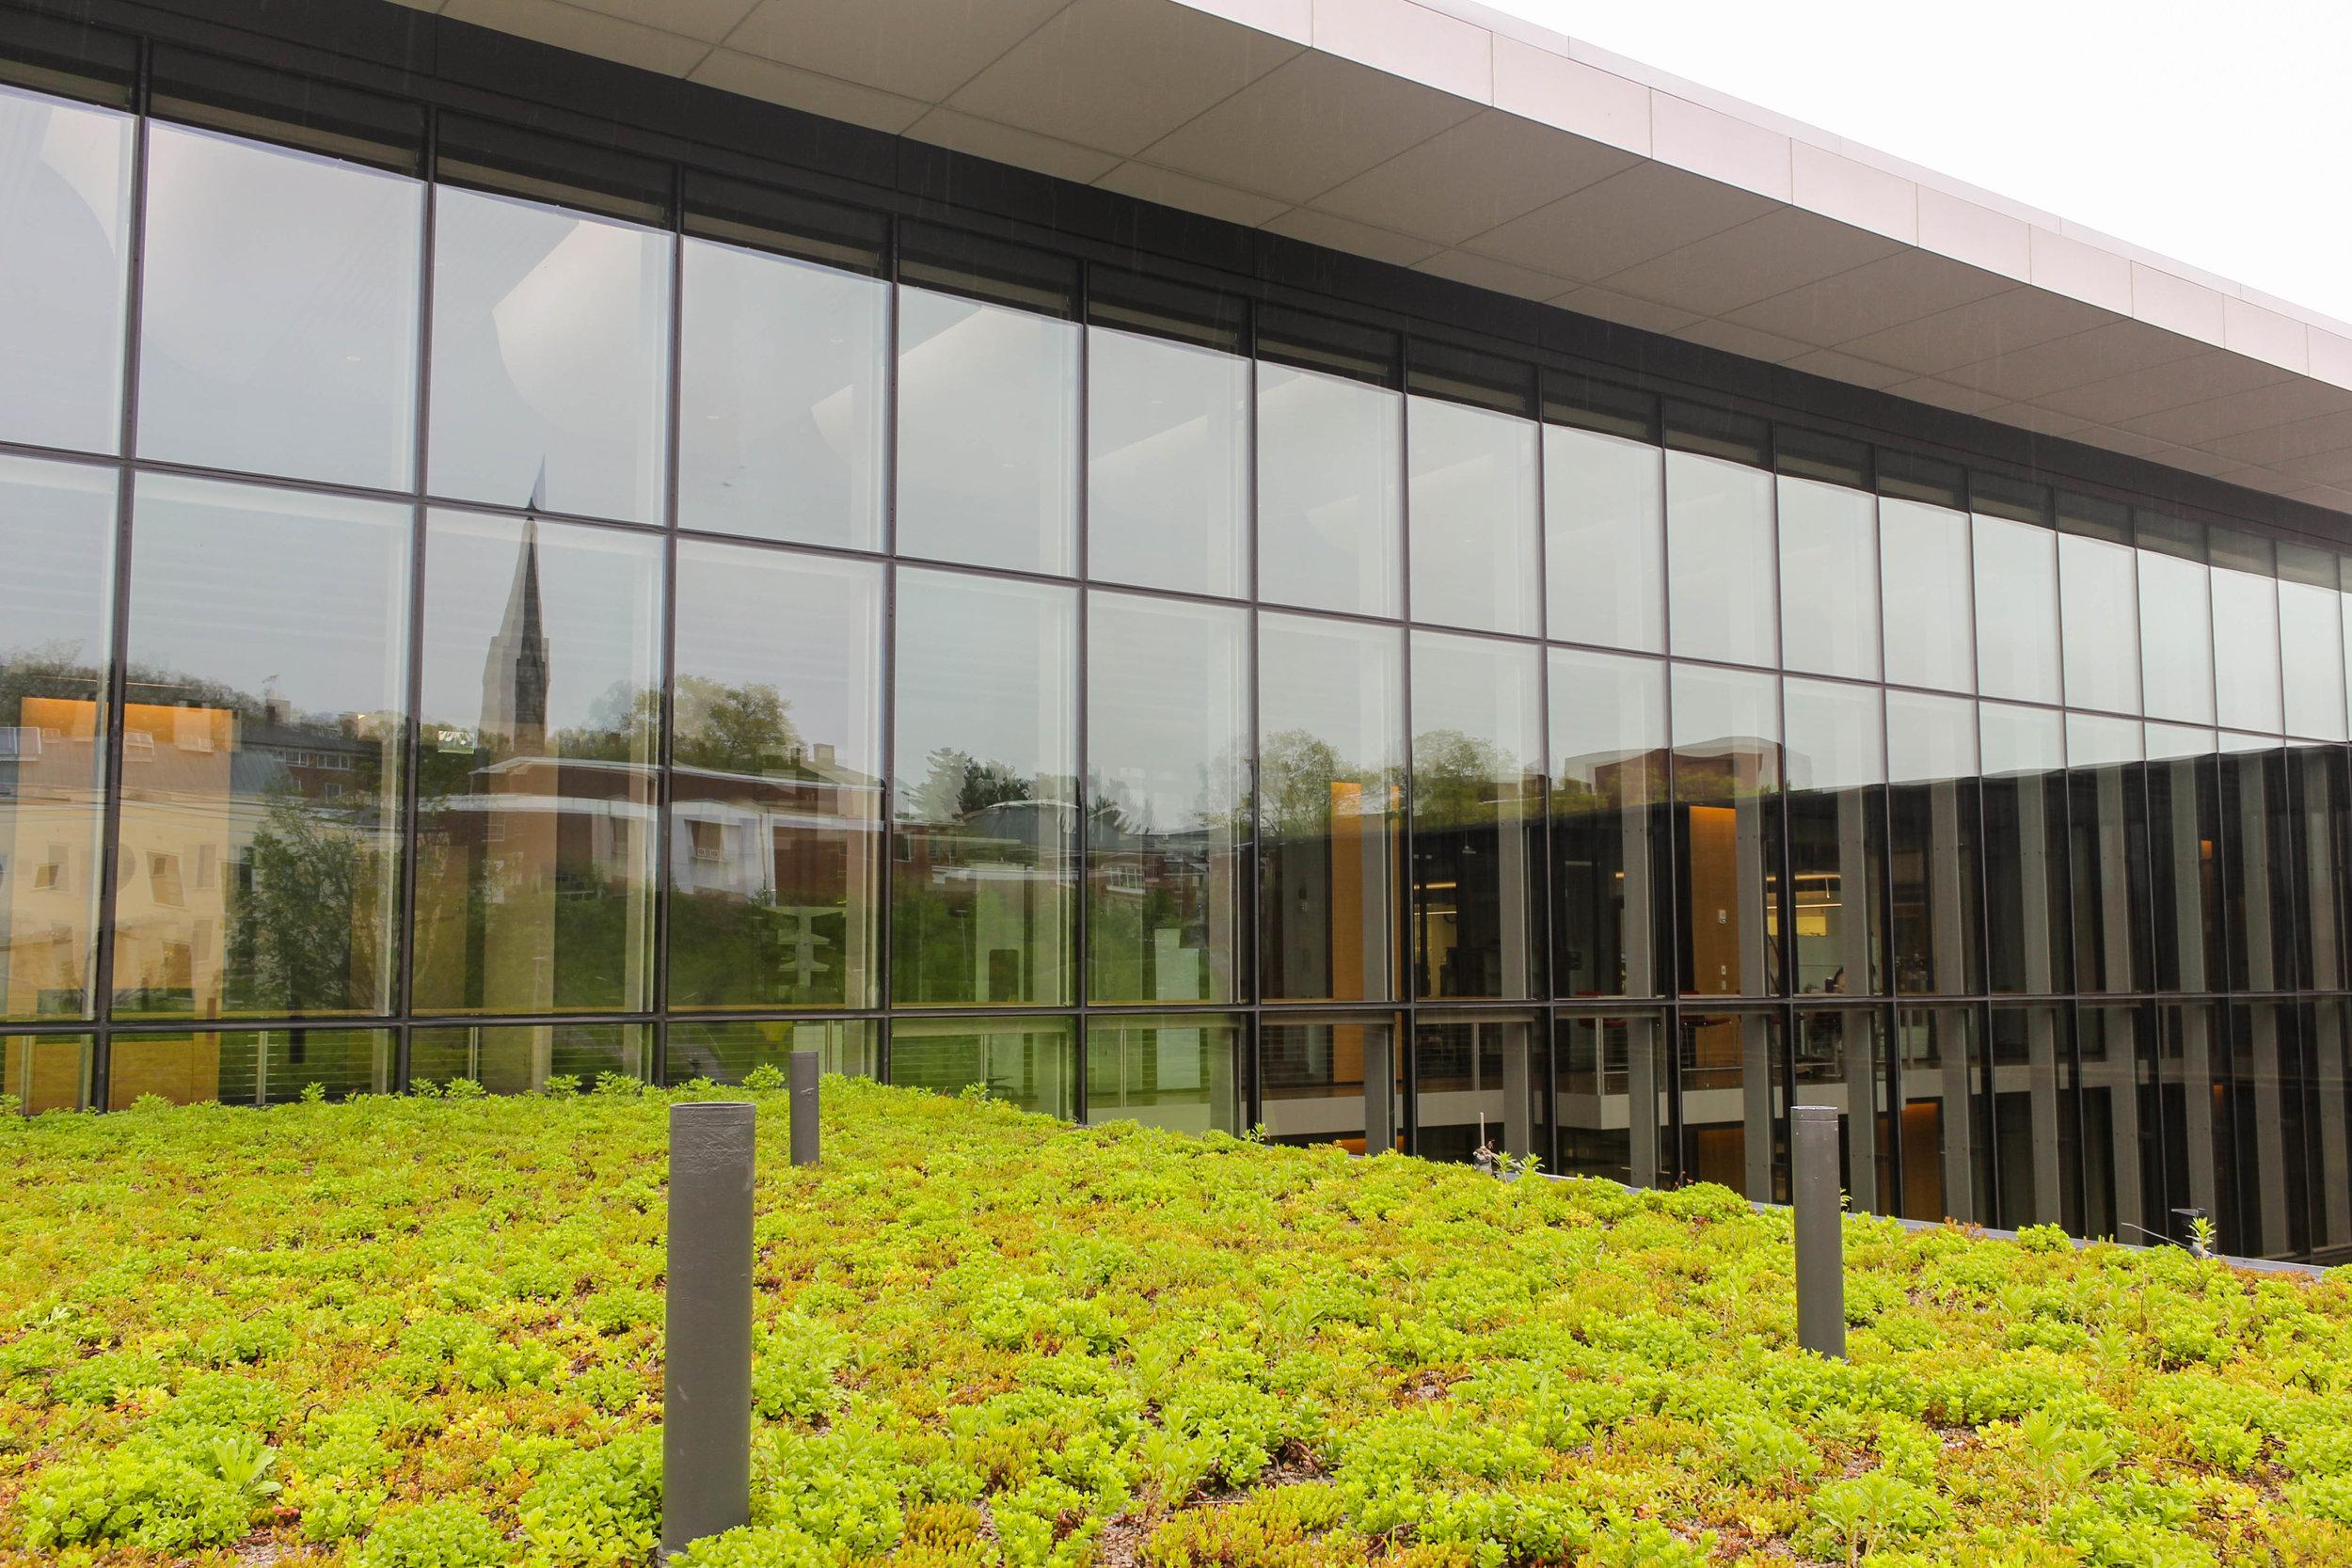 amherst_college_science_center-6.jpg